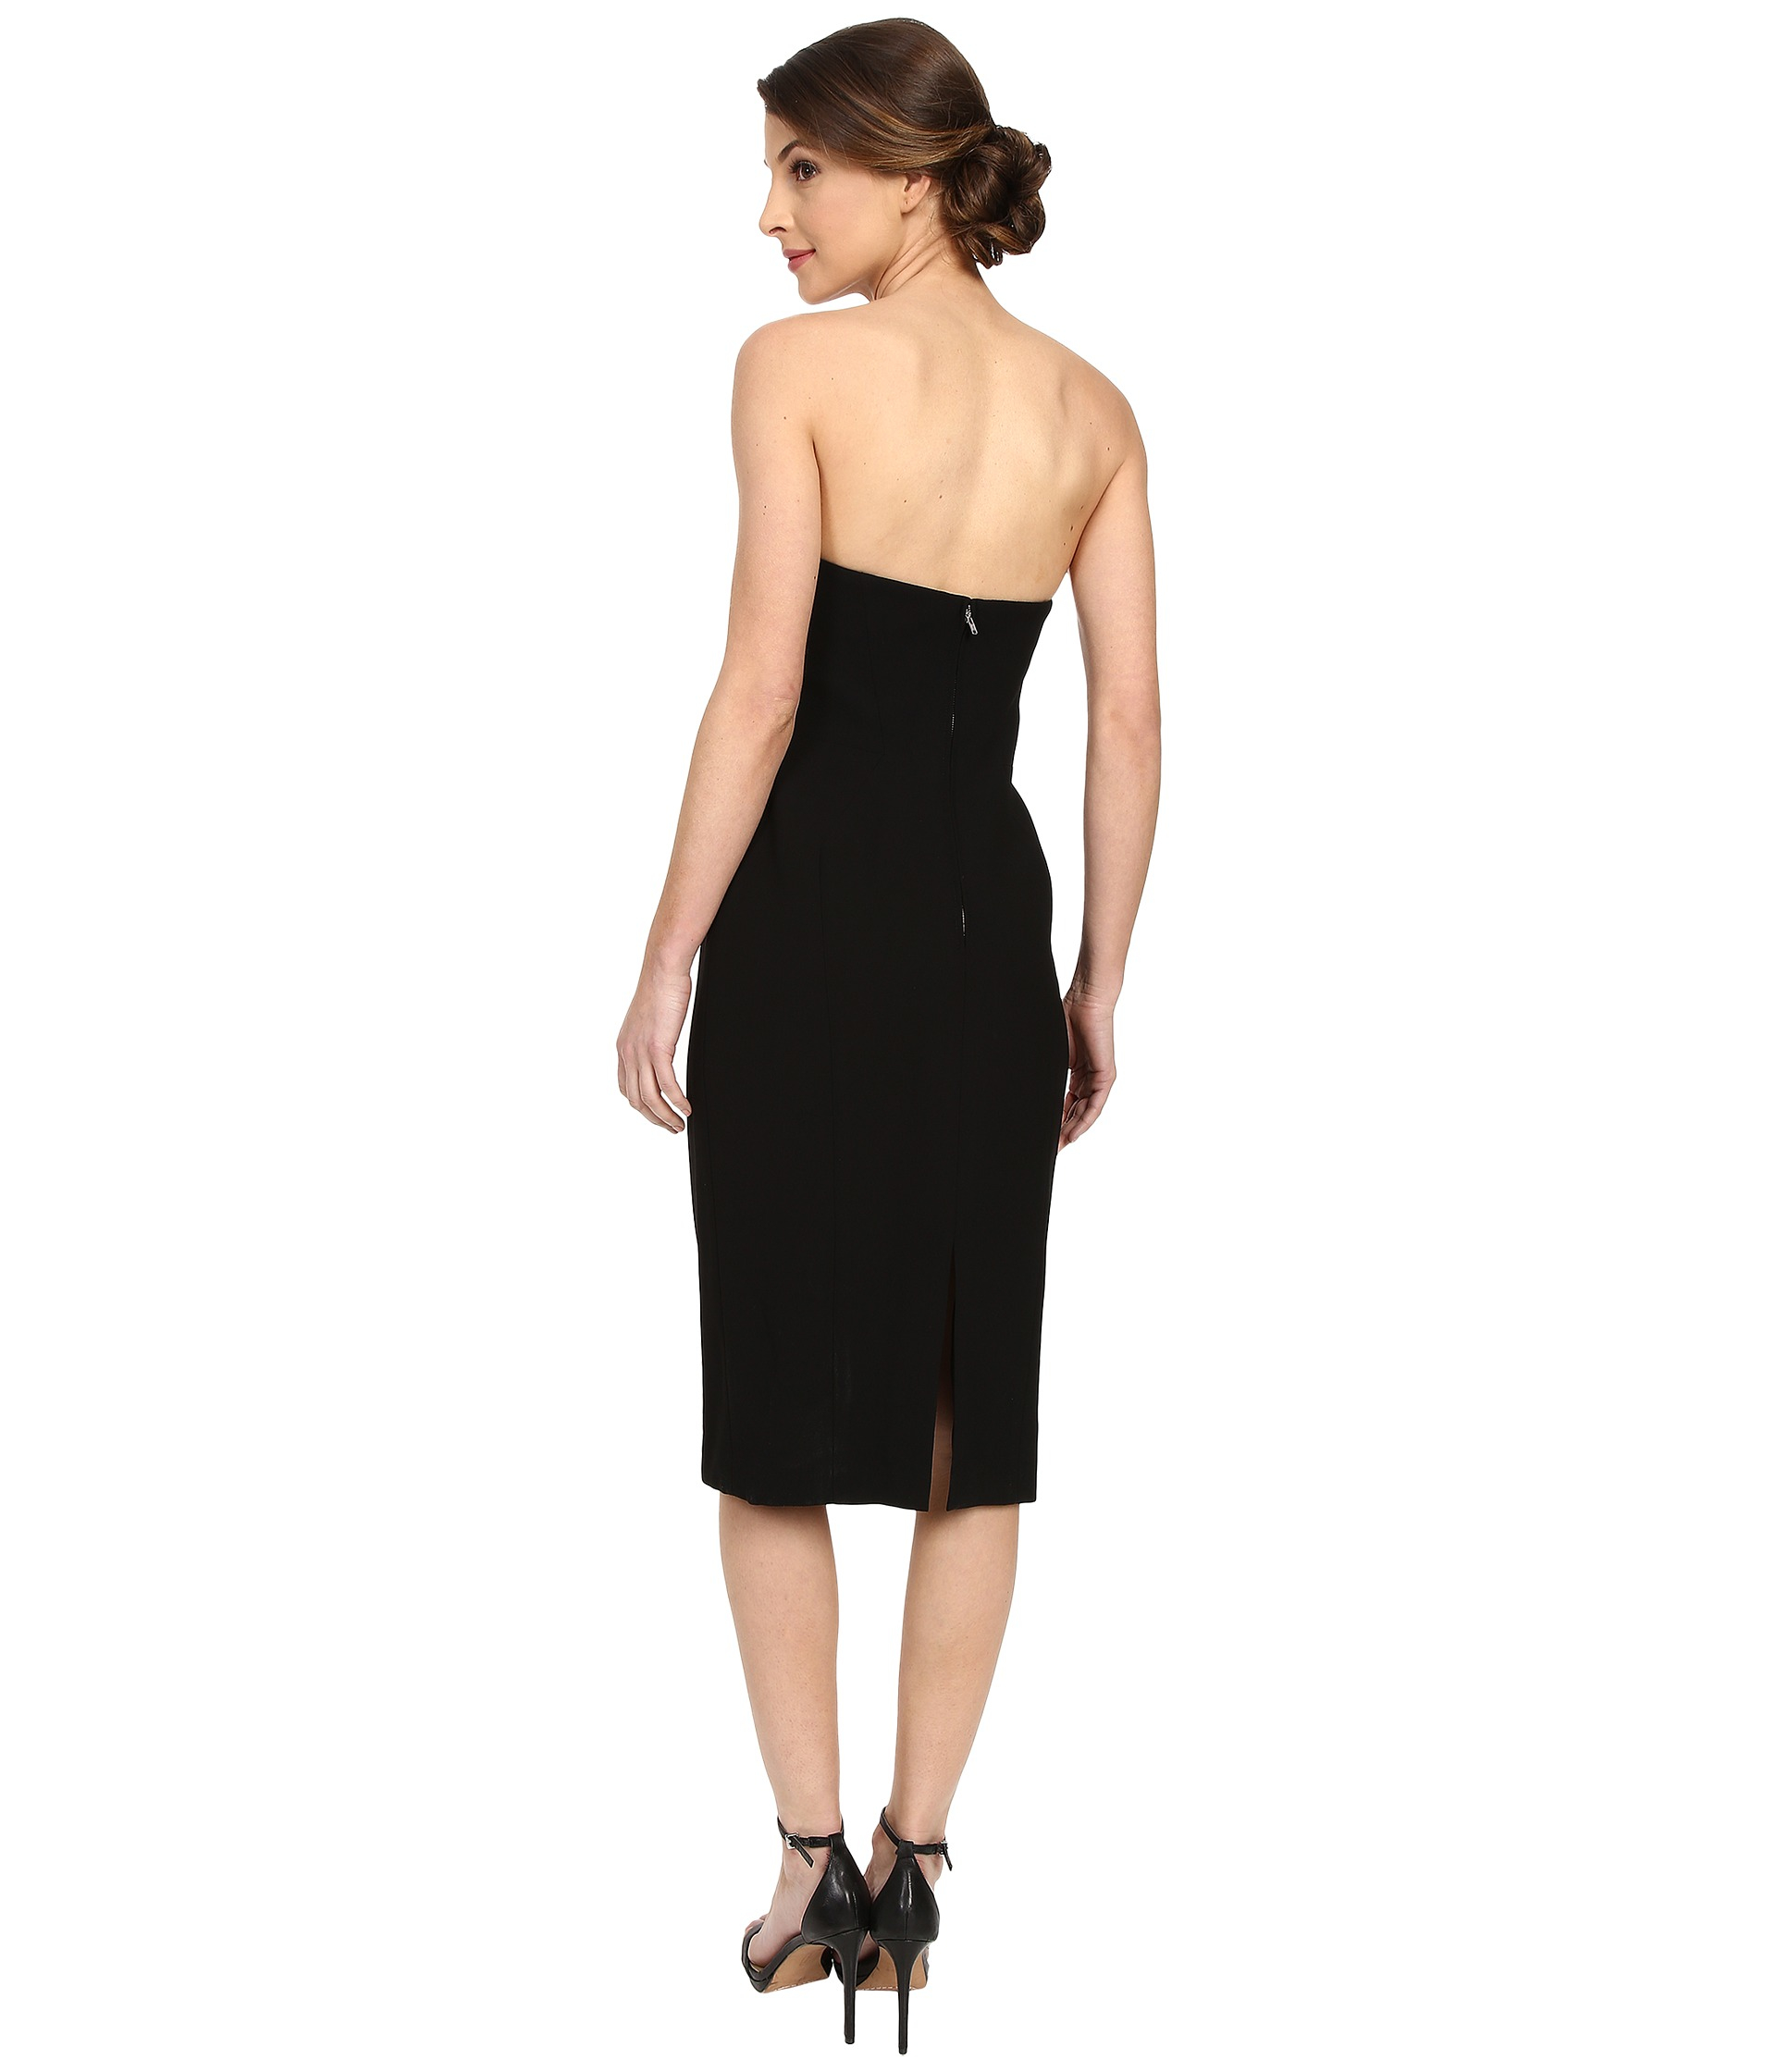 Jill jill stuart Strapless Knee Length Fitted Crepy Dress in Black ...